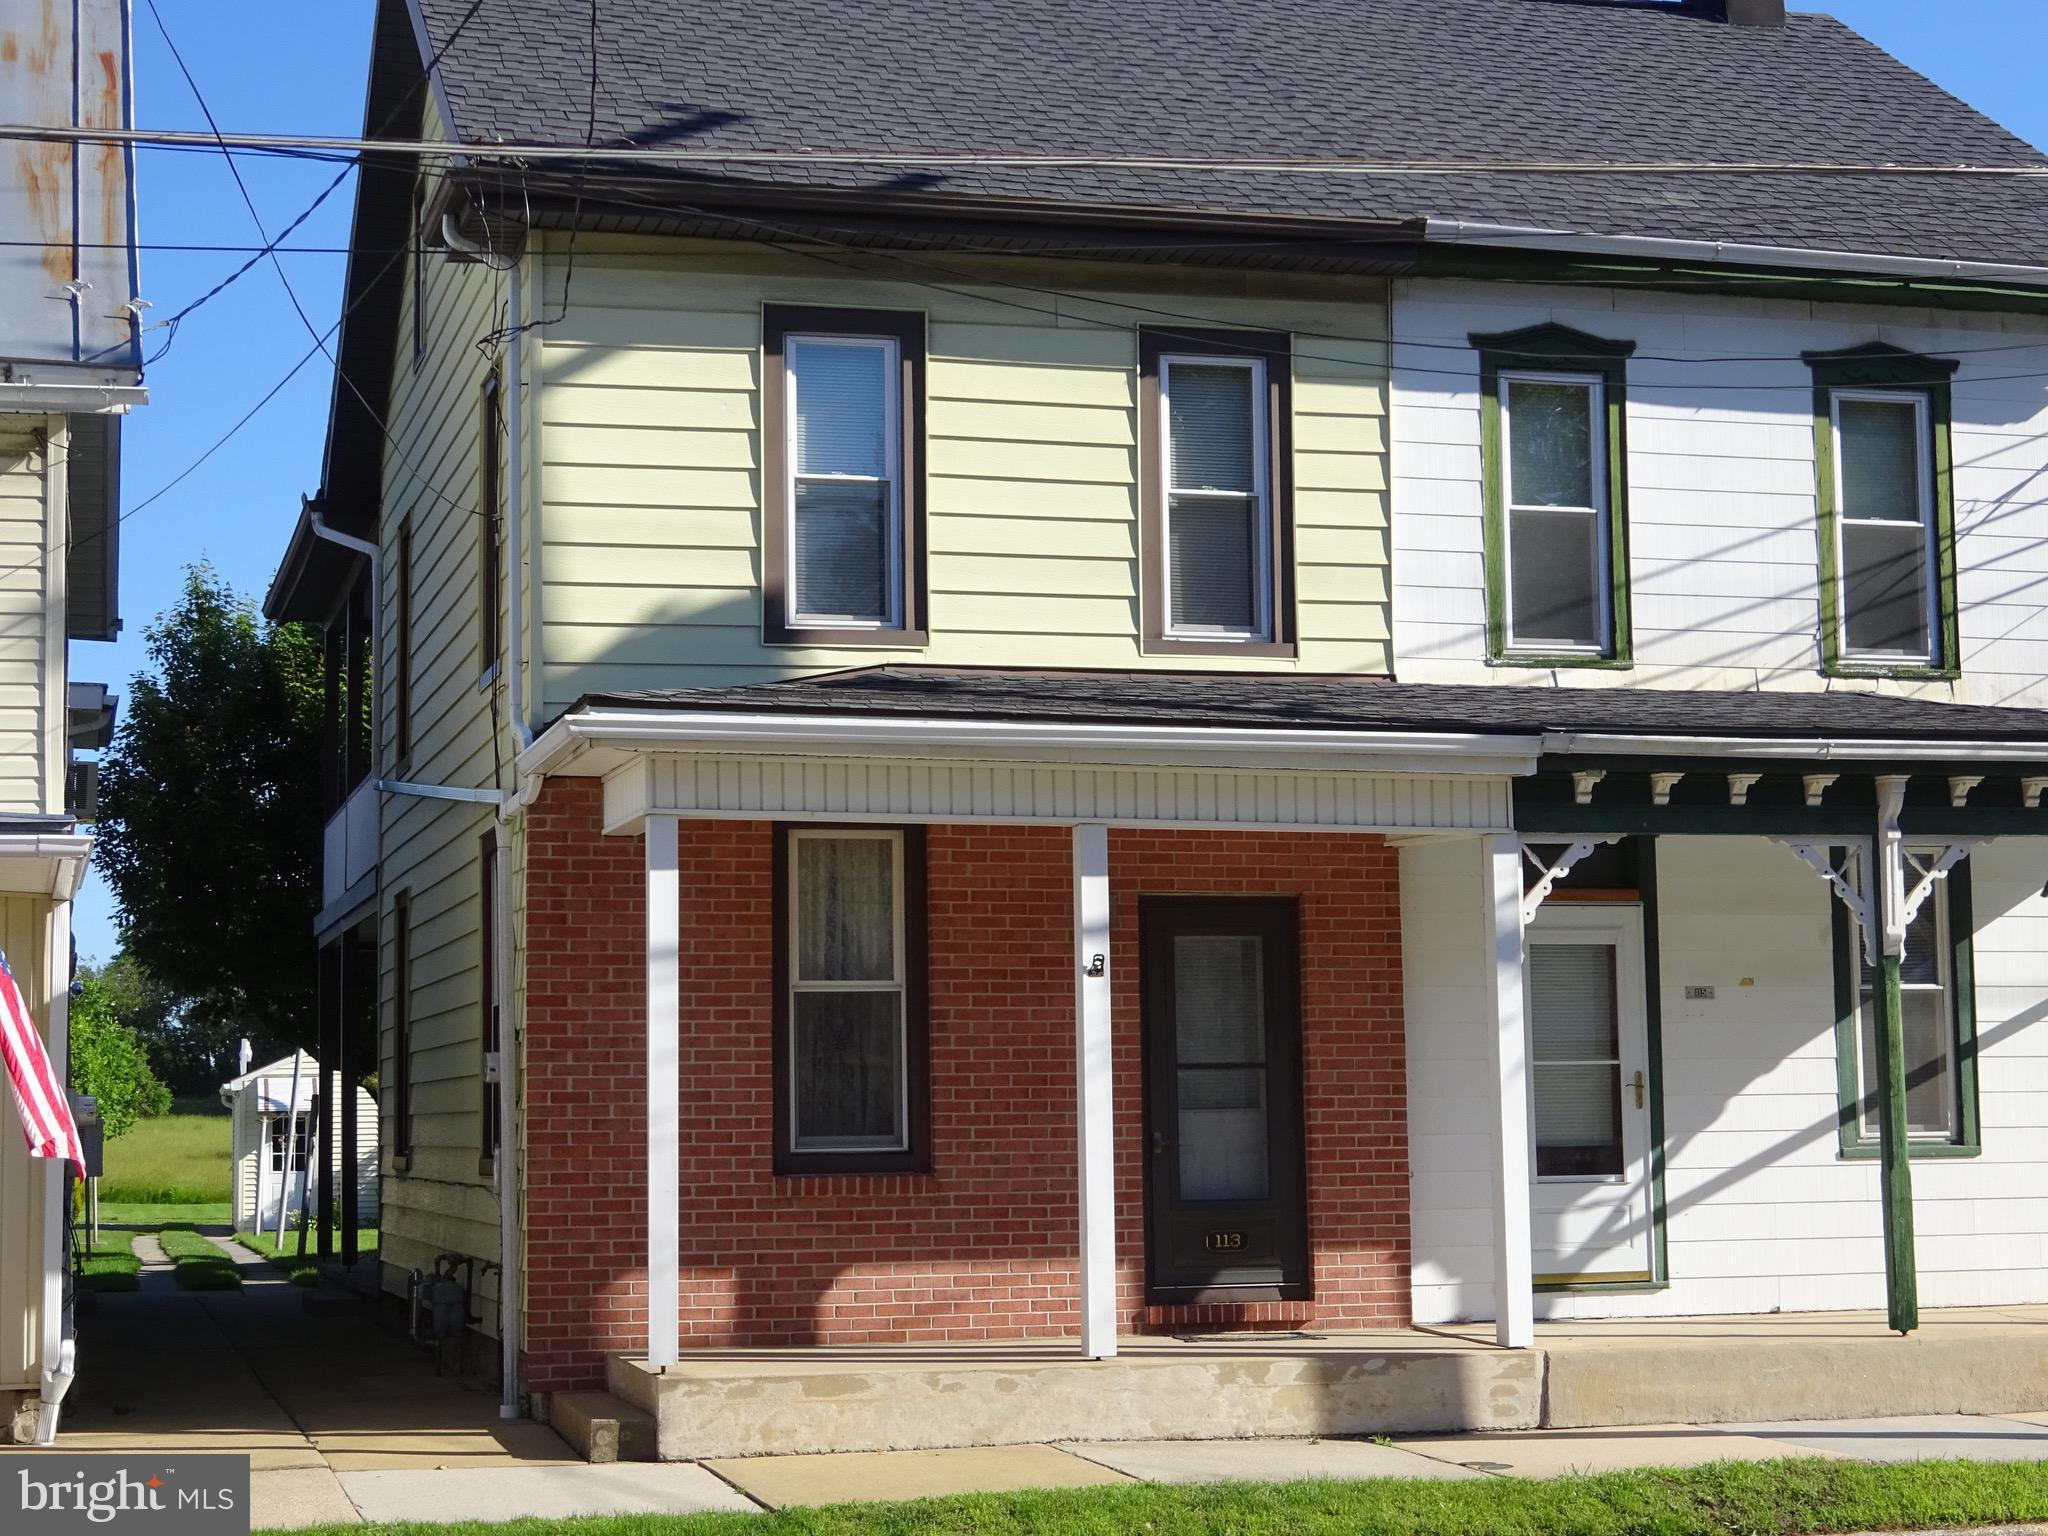 113 E MAIN STREET, NEWMANSTOWN, PA 17073